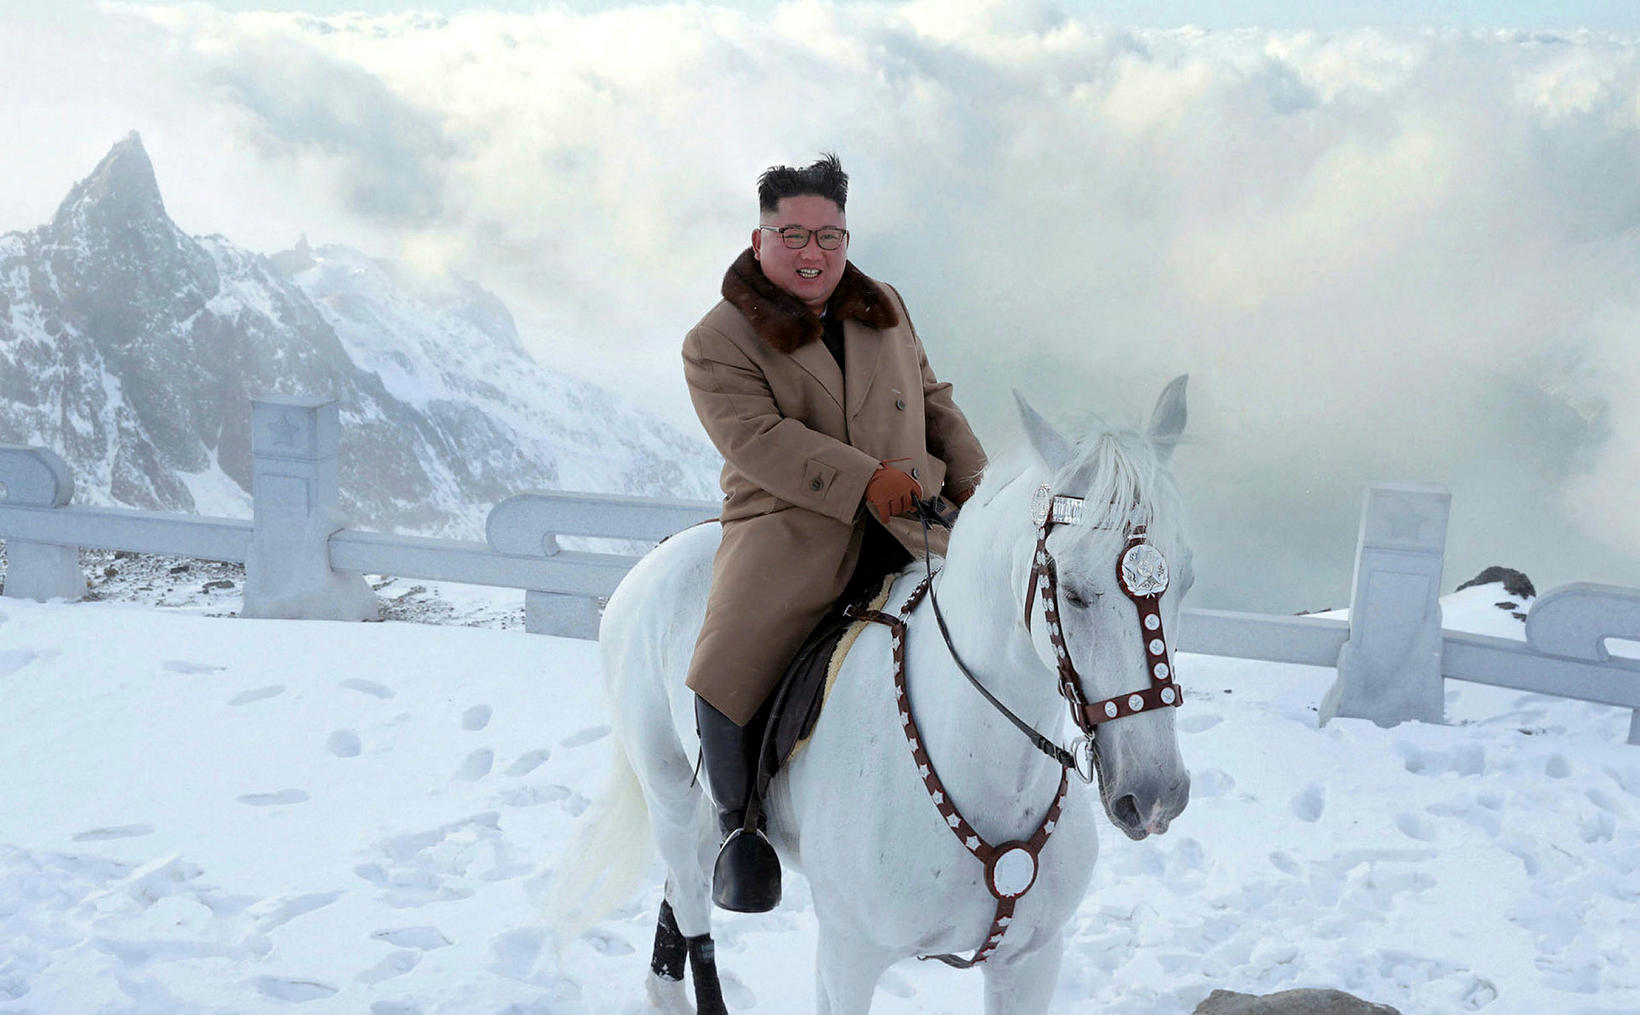 Kim Jong-un á hvítum hesti á snæviþaktri jörð.